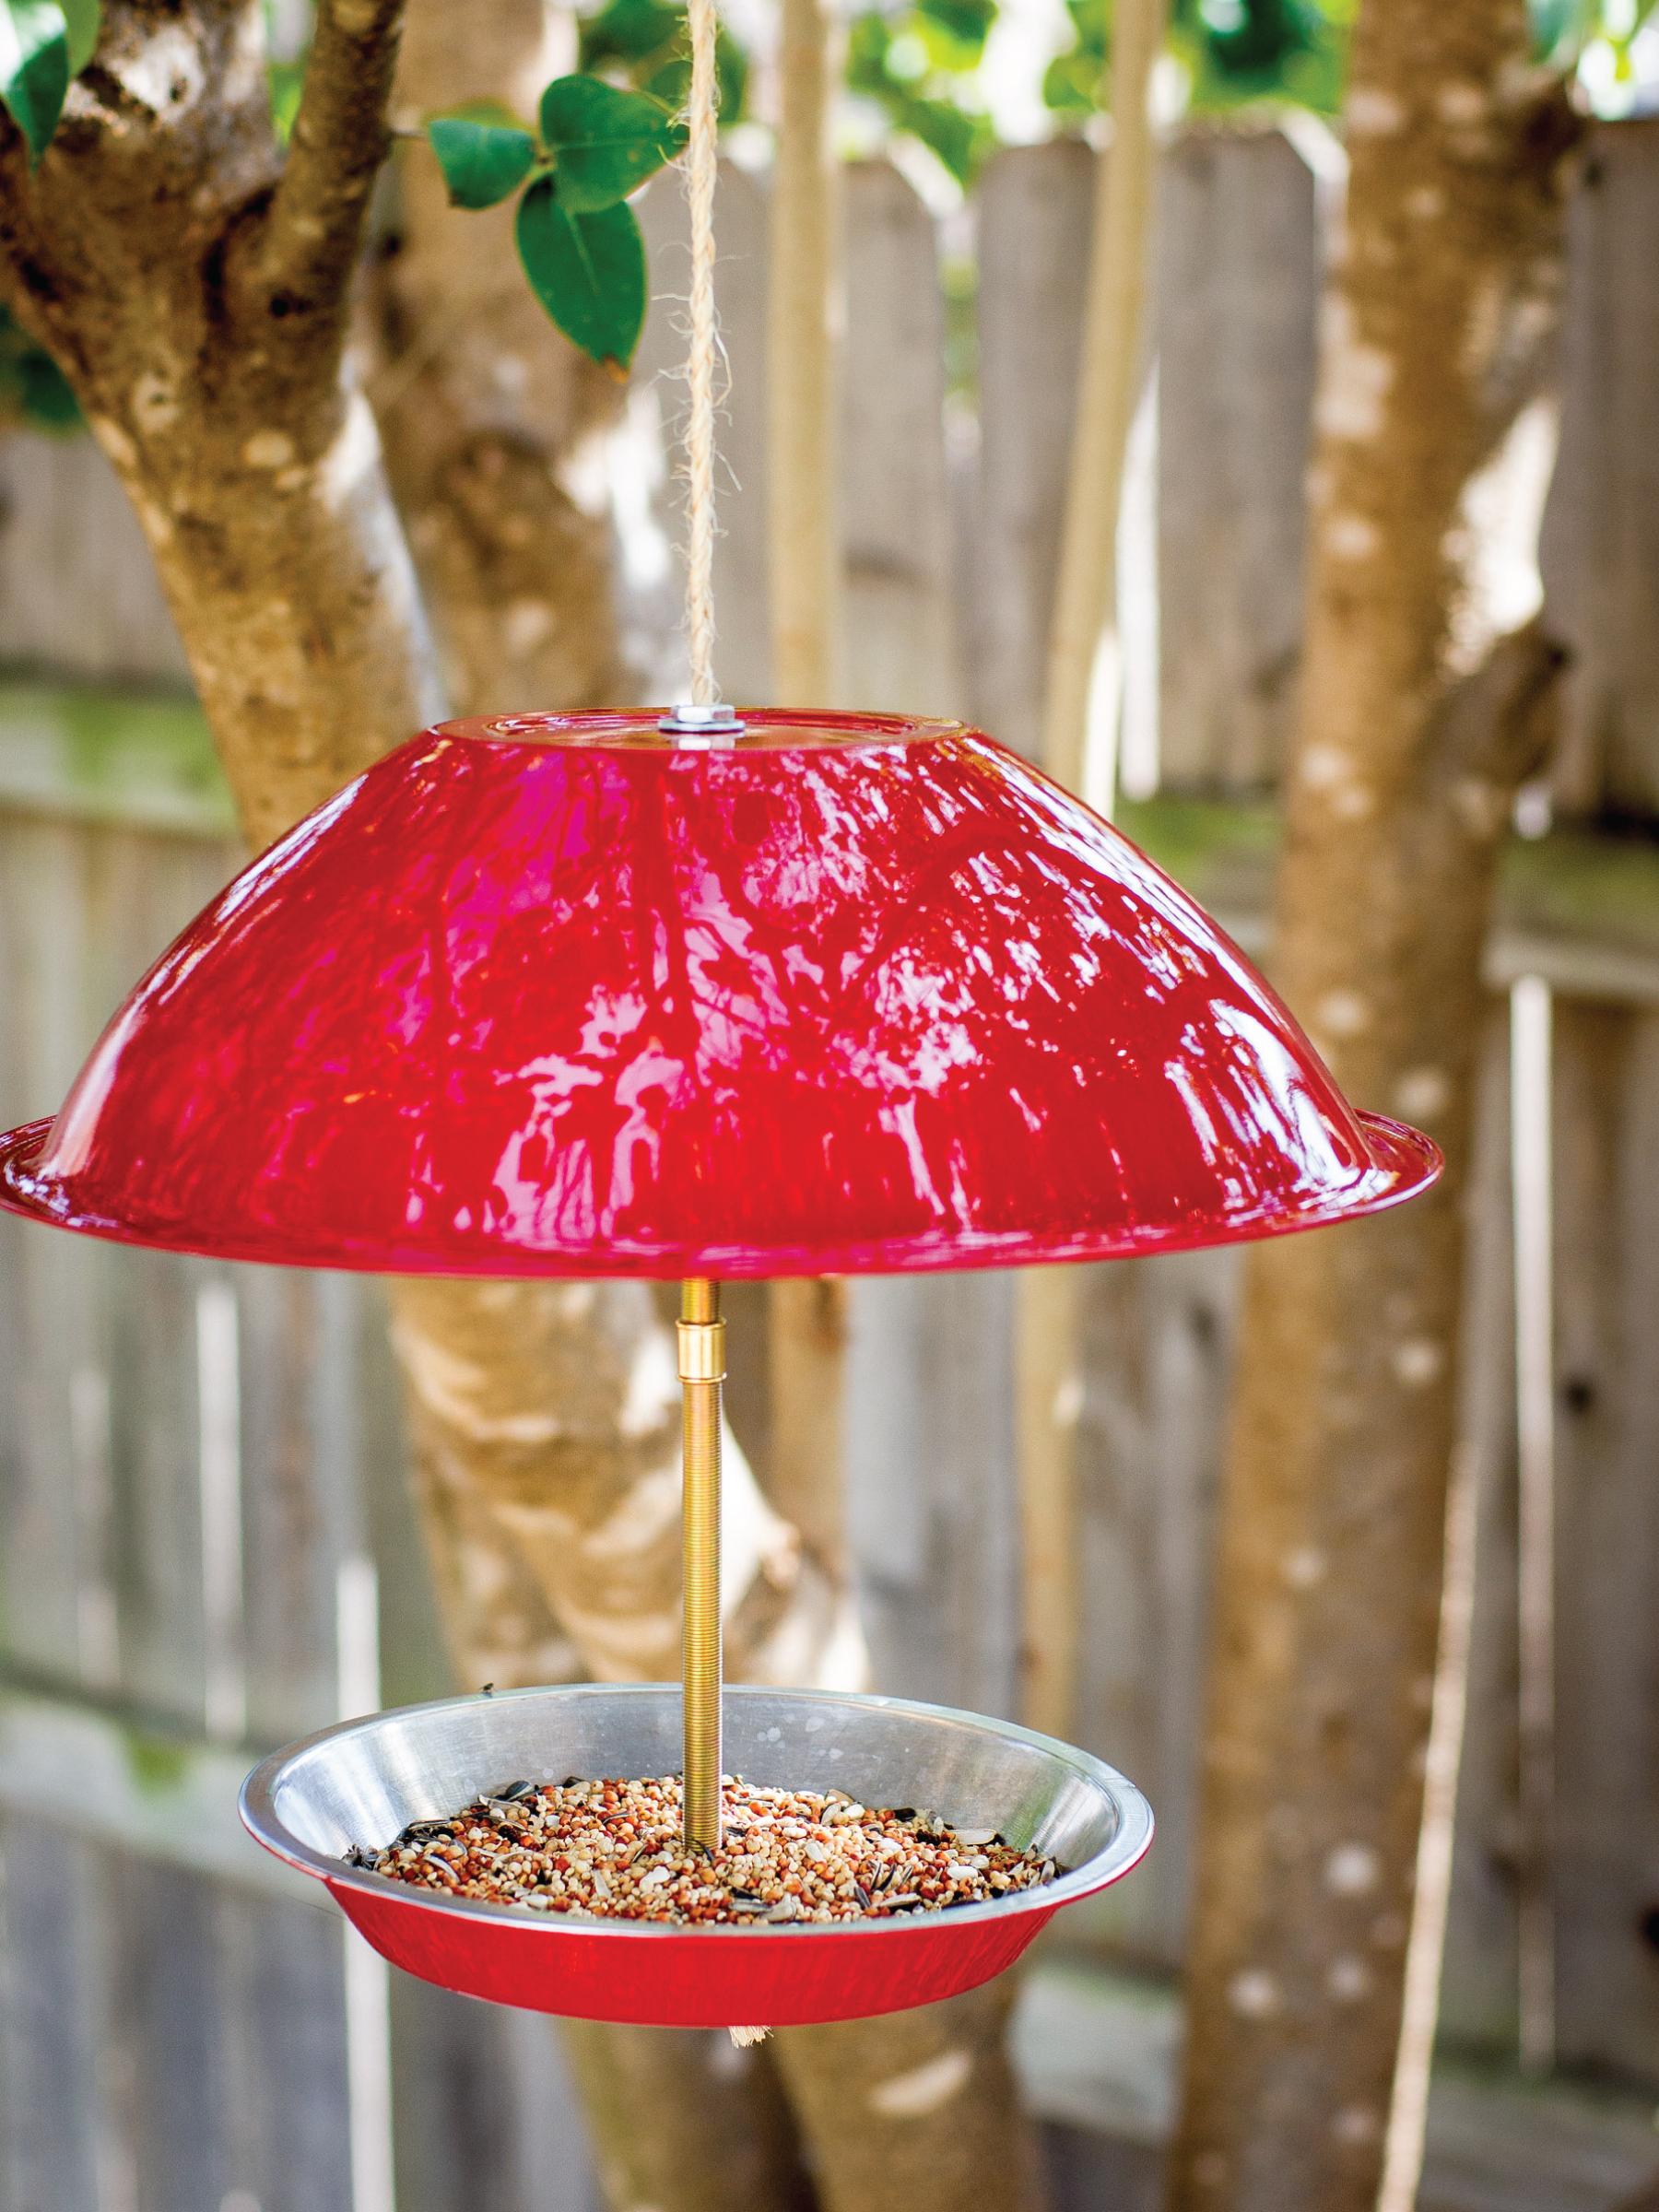 Upcycled Bird Feeder by Sam Henderson of Today's Nest for HGTVGardens.